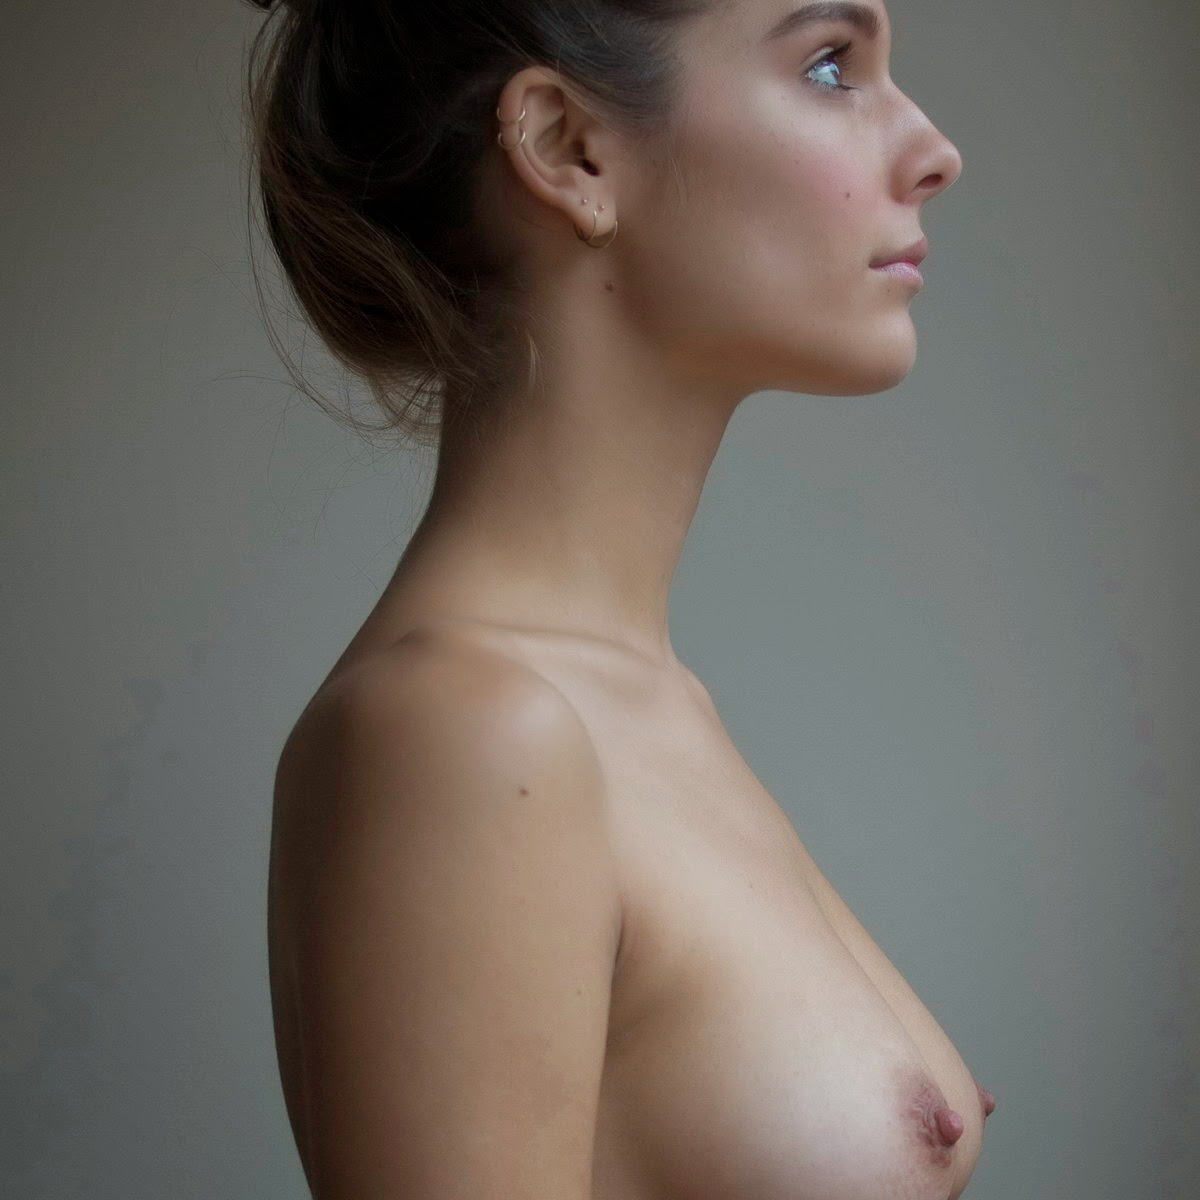 free naked moms videos